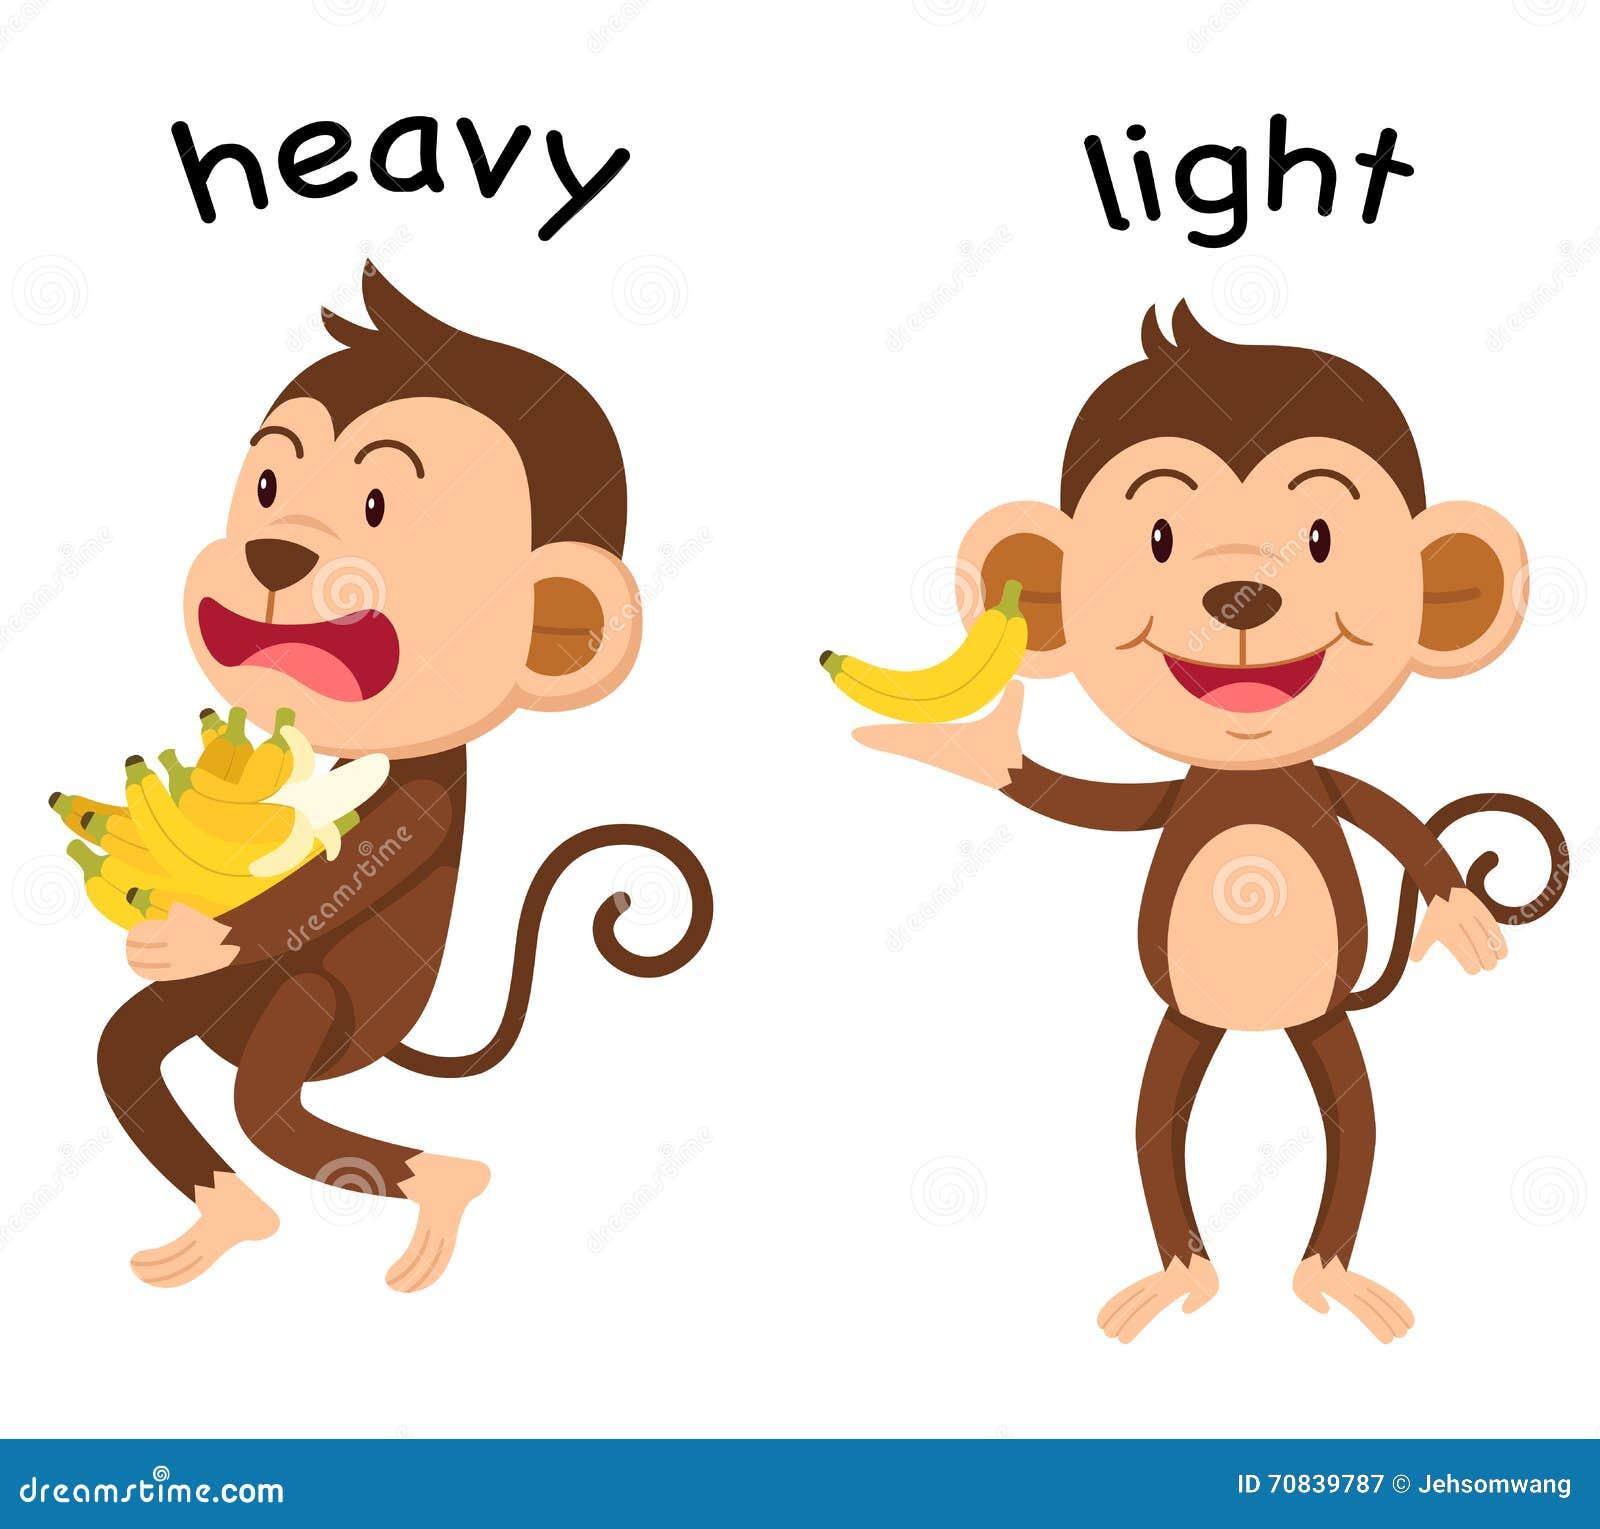 opposite words heavy and light vector stock vector illustration of